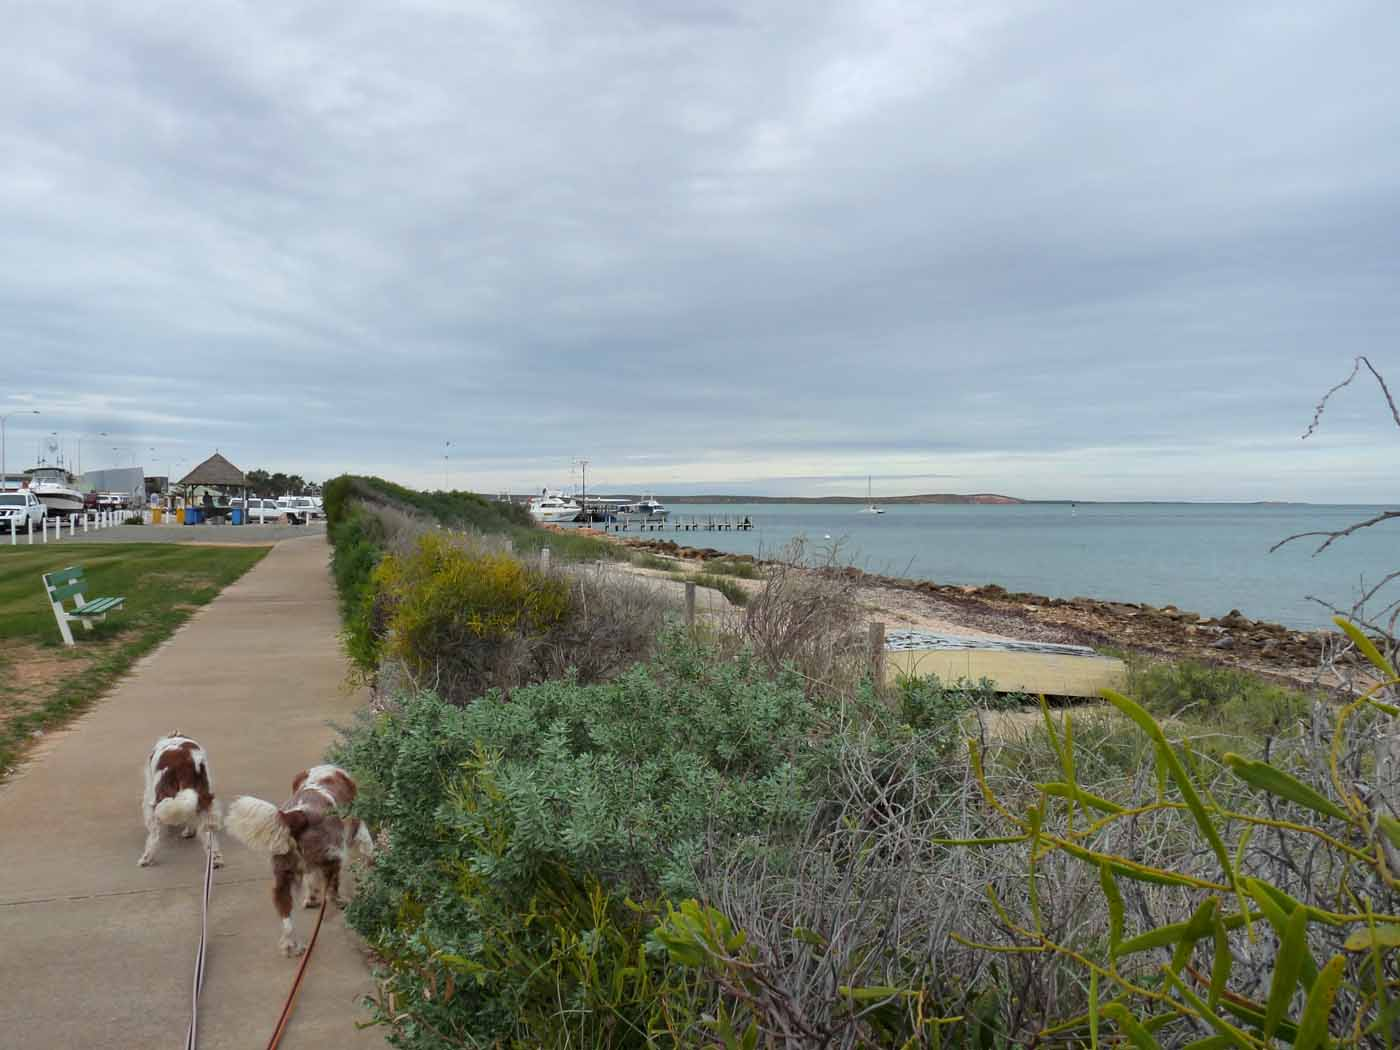 Denham Australia  city photos gallery : Denham Seaside Tourist Village, Western Australia | An adventure ...